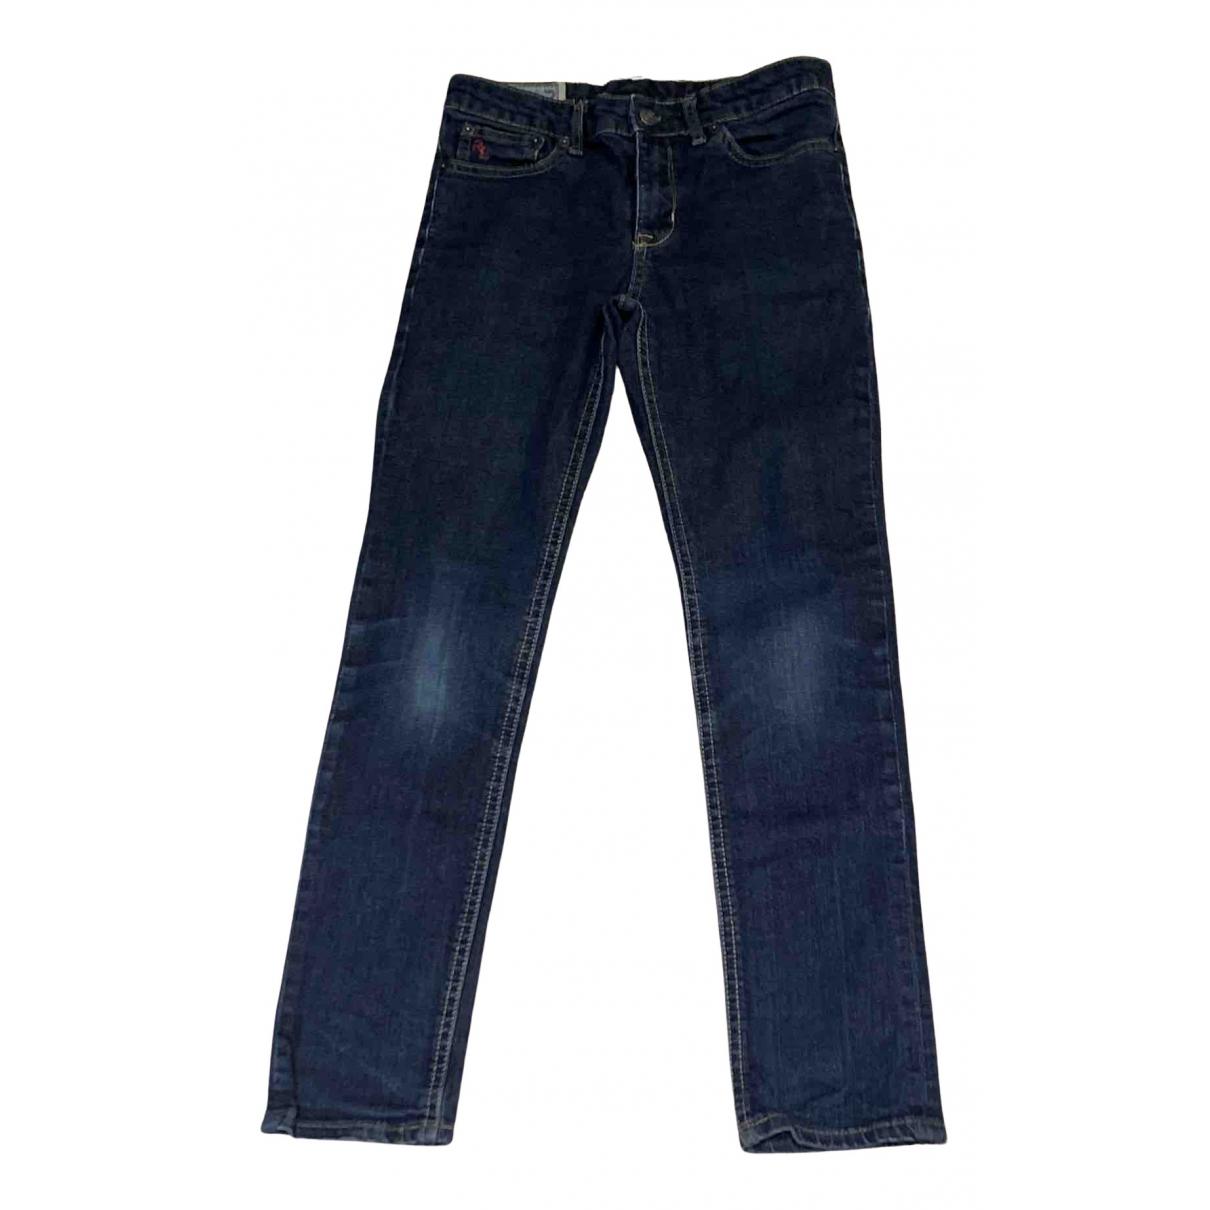 Polo Ralph Lauren - Pantalon   pour enfant en denim - bleu